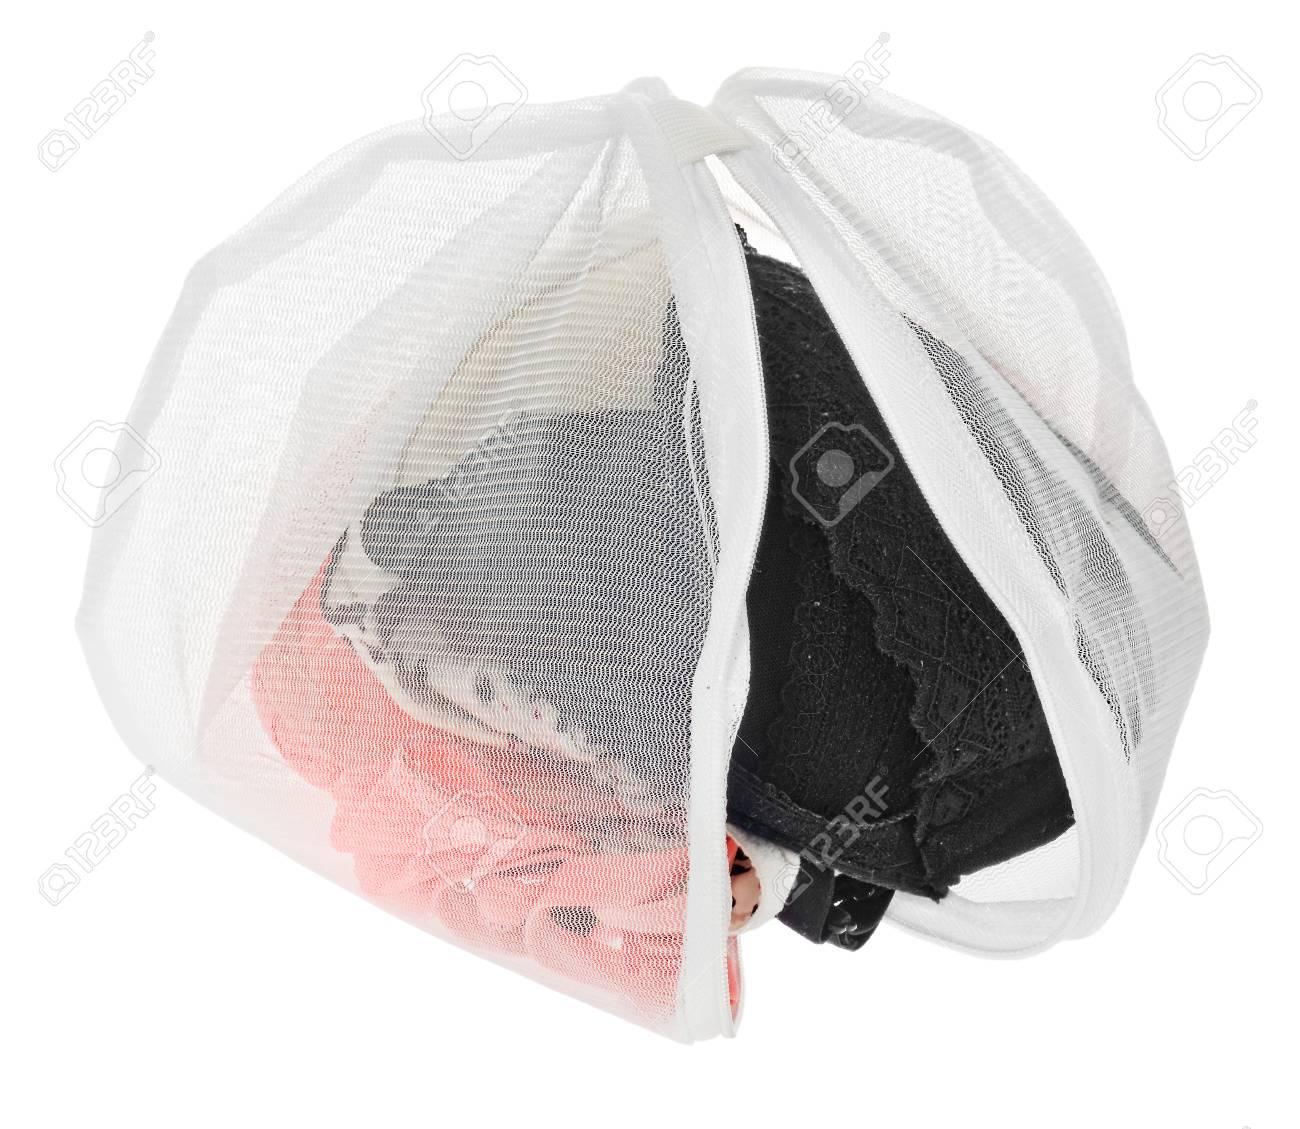 f8a38425d0662 Bra Wash Bag